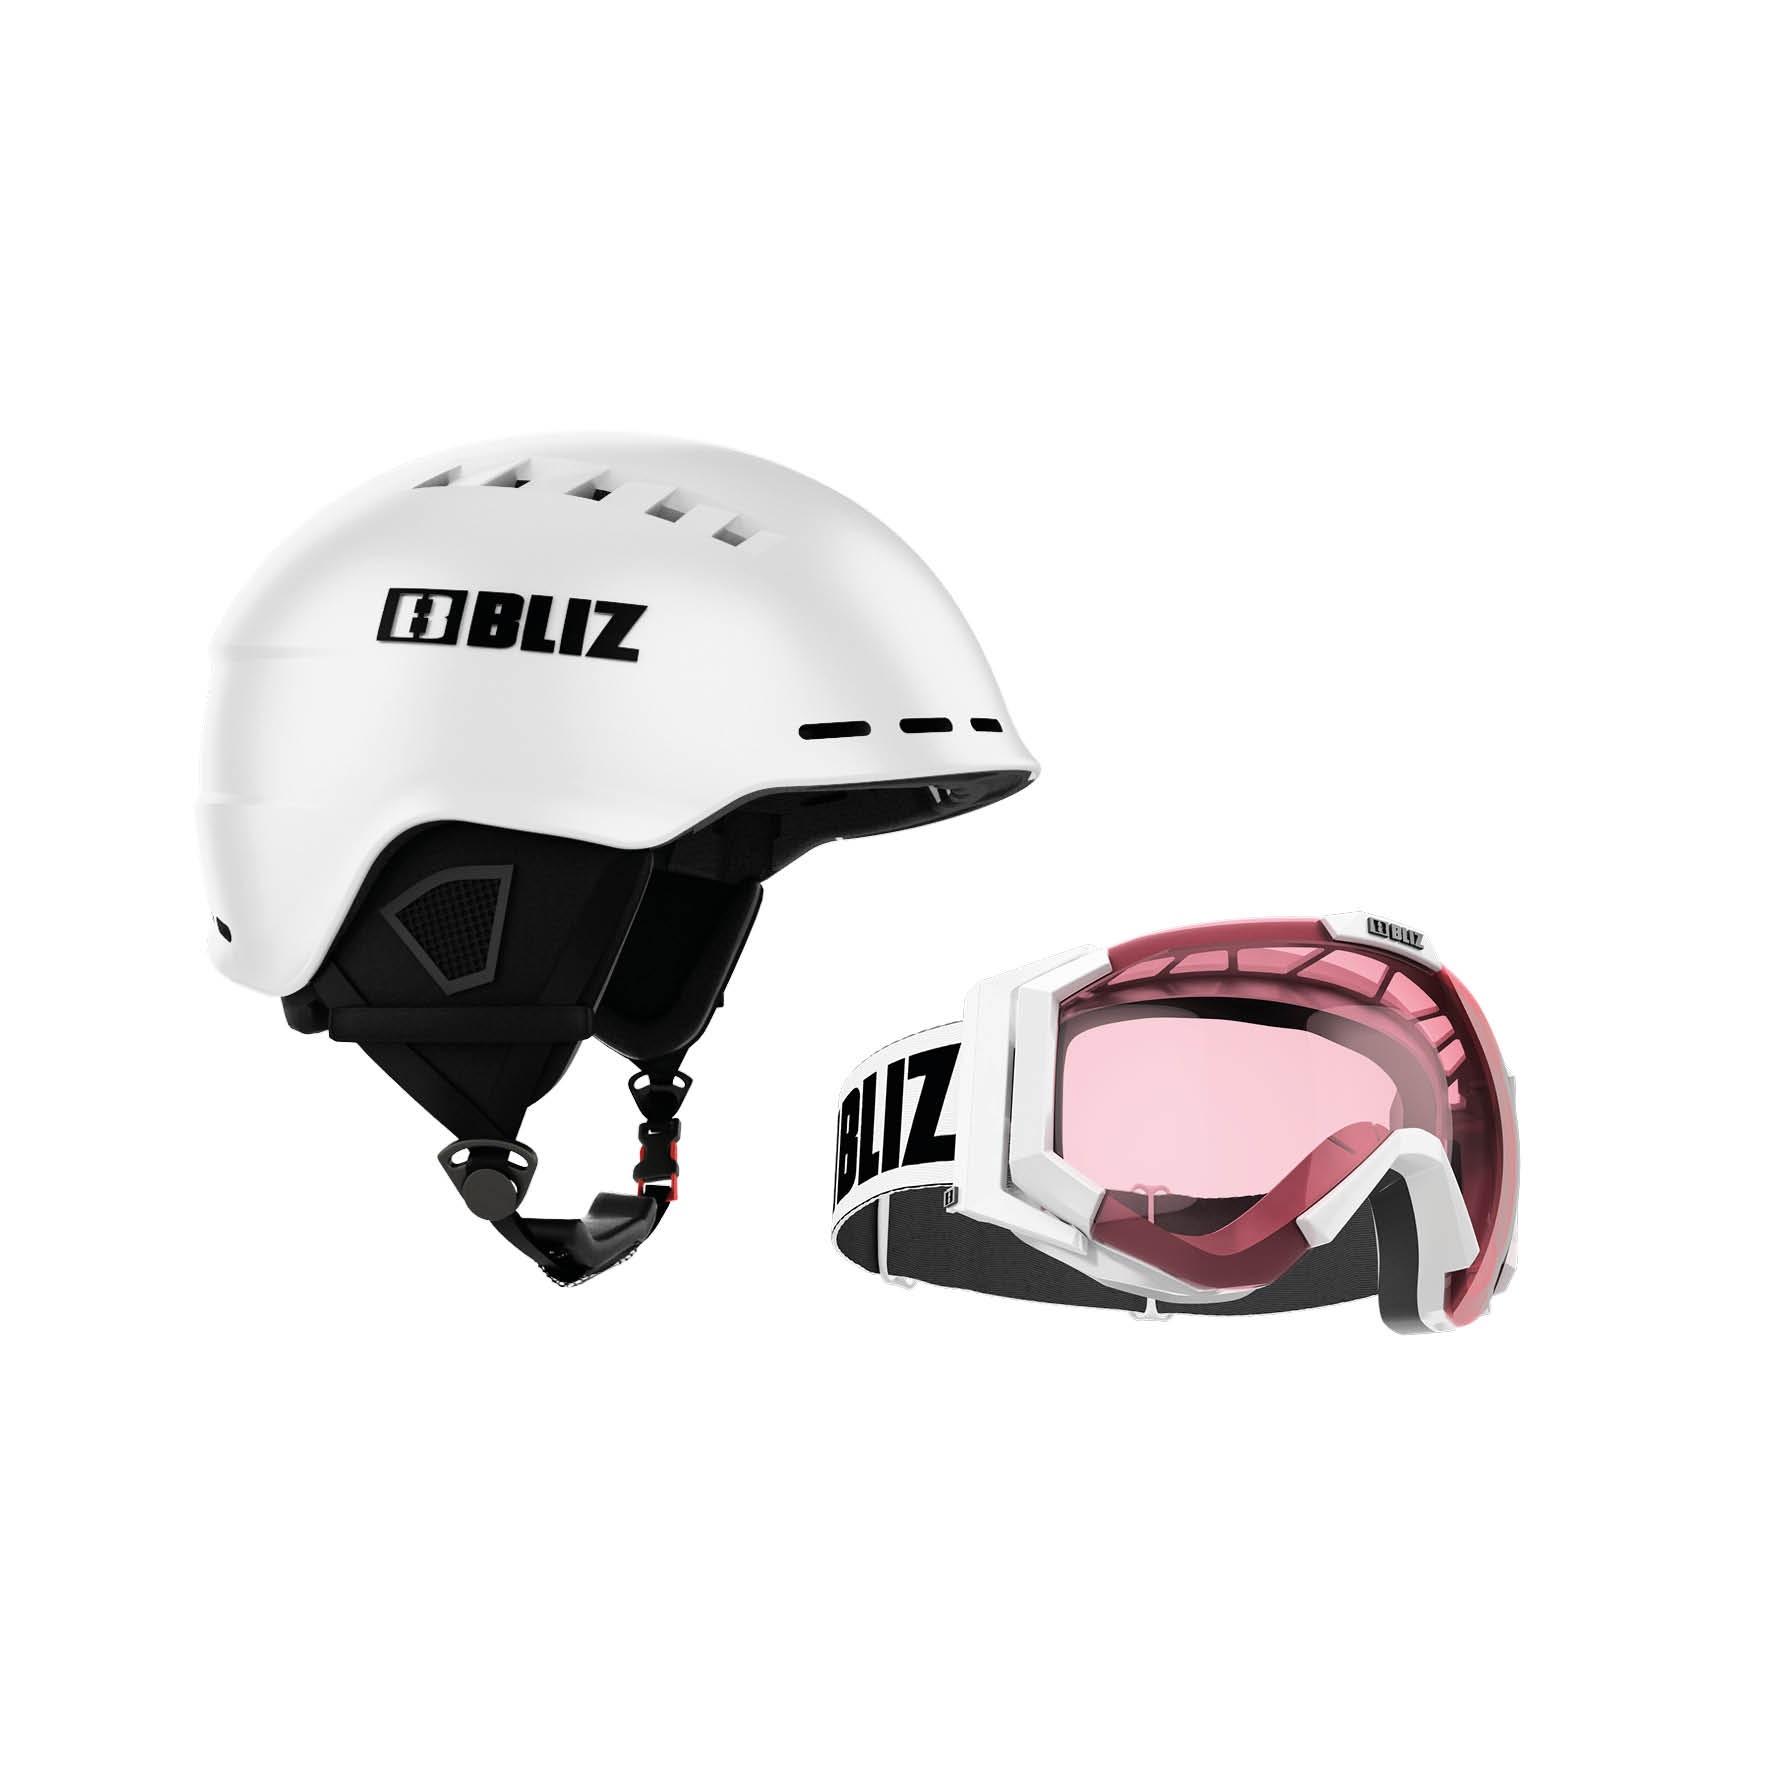 Cască Snowboard -  bliz Set Head Cover + Carver